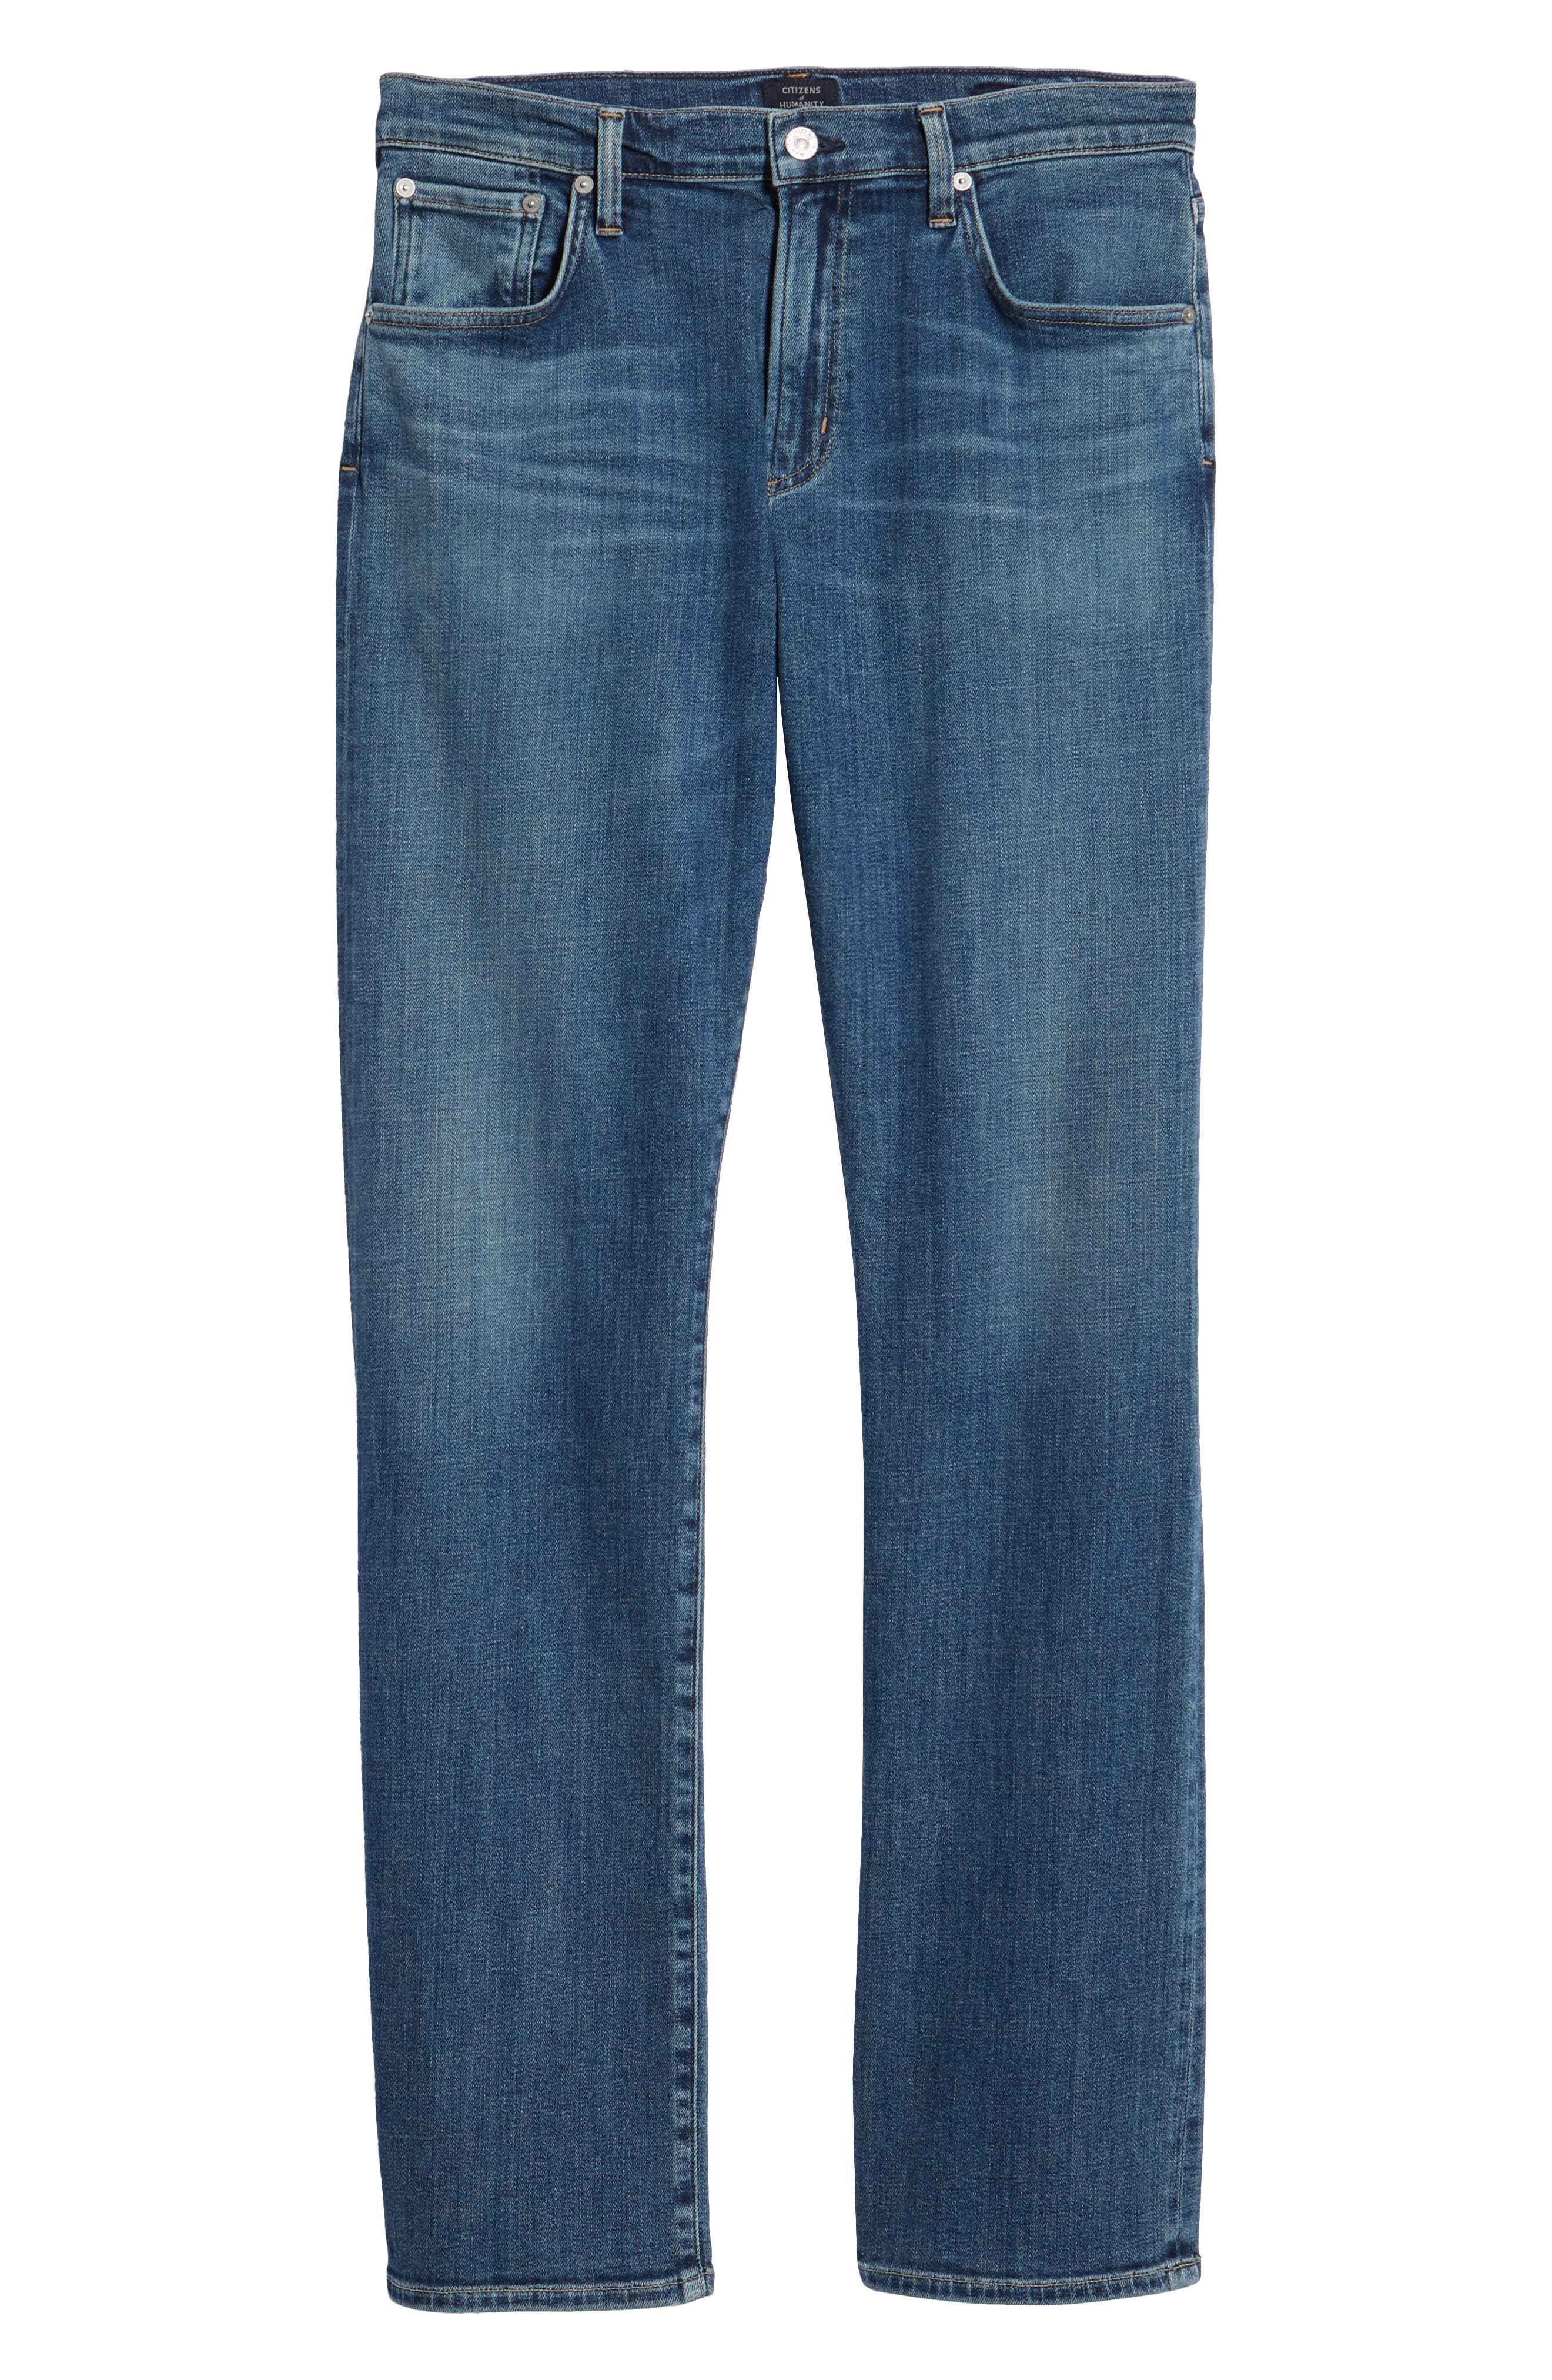 Sid Straight Leg Jeans,                             Alternate thumbnail 6, color,                             AURORA